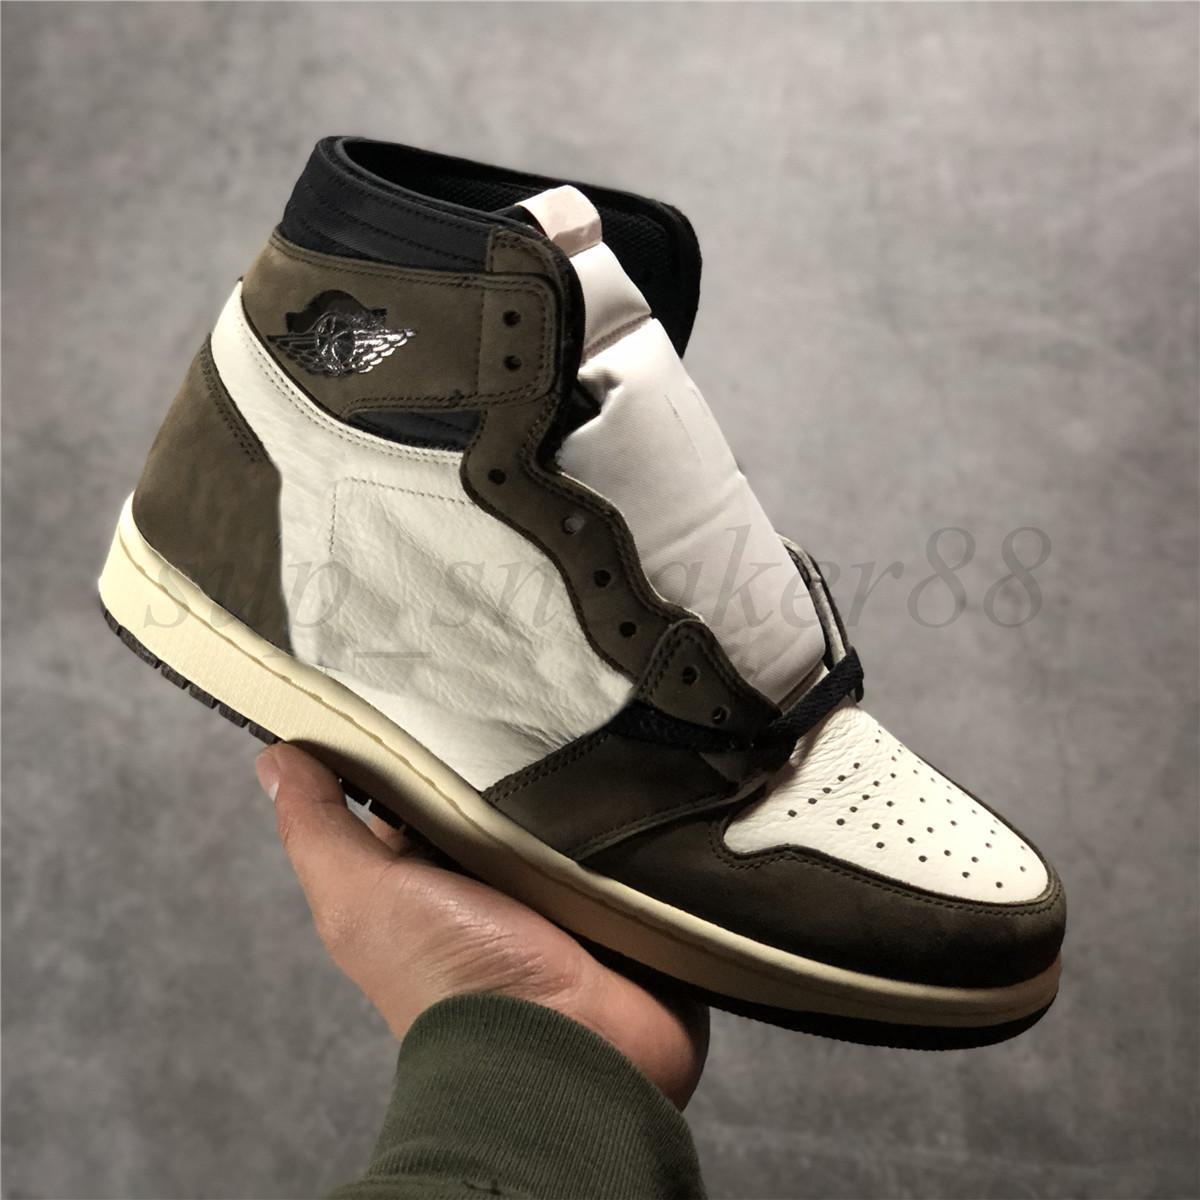 Con caja 2021 para mujer Mens Jumpman 1 1s Zapatillas de baloncesto Mid Atomic Orange Apenas Familia Banned Banned High OG Volt Twist Trayers Sneakers